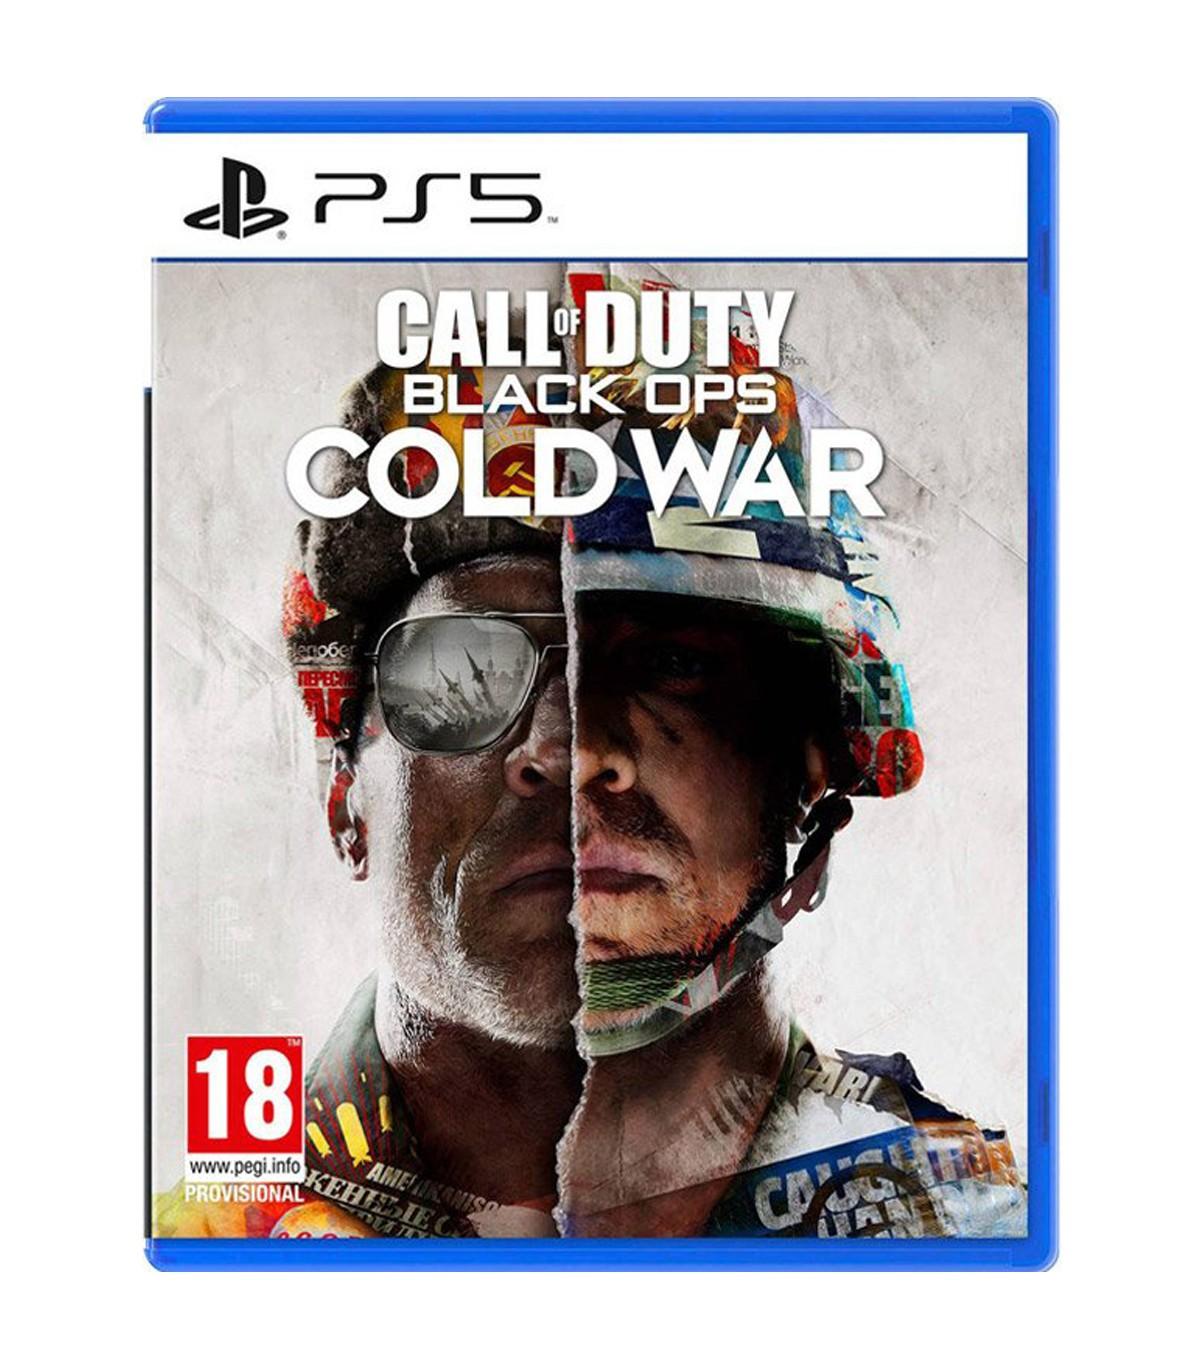 بازی Call of Duty: Black Ops Cold War کارکرده - پلی استیشن 5